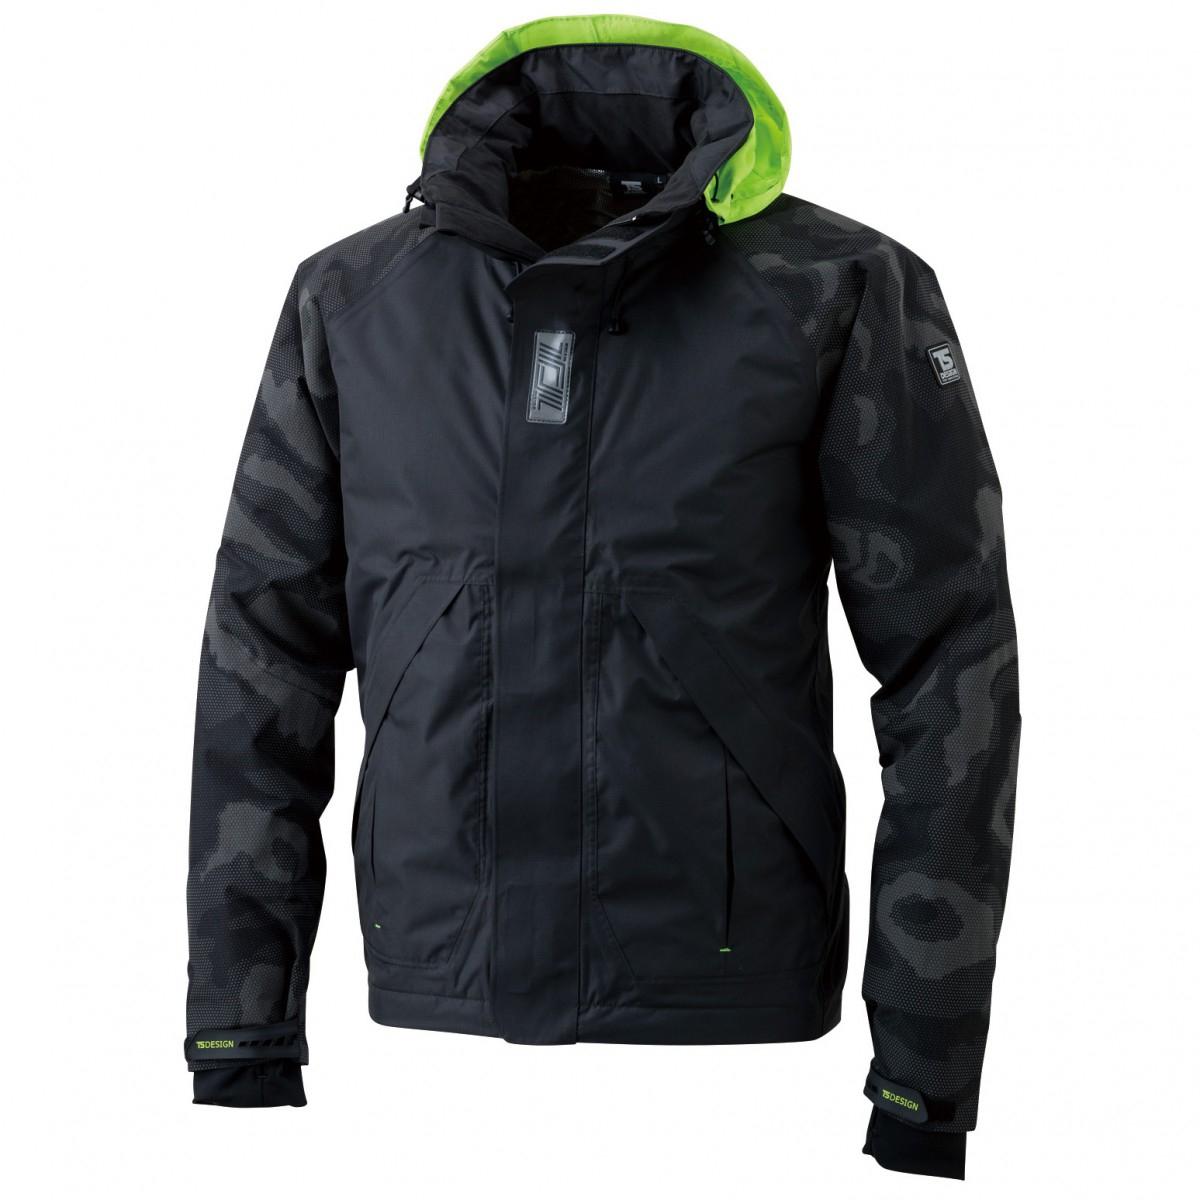 TS DESIGN  18236 メガヒートフラッシュ防水防寒ジャケット 95ブラック